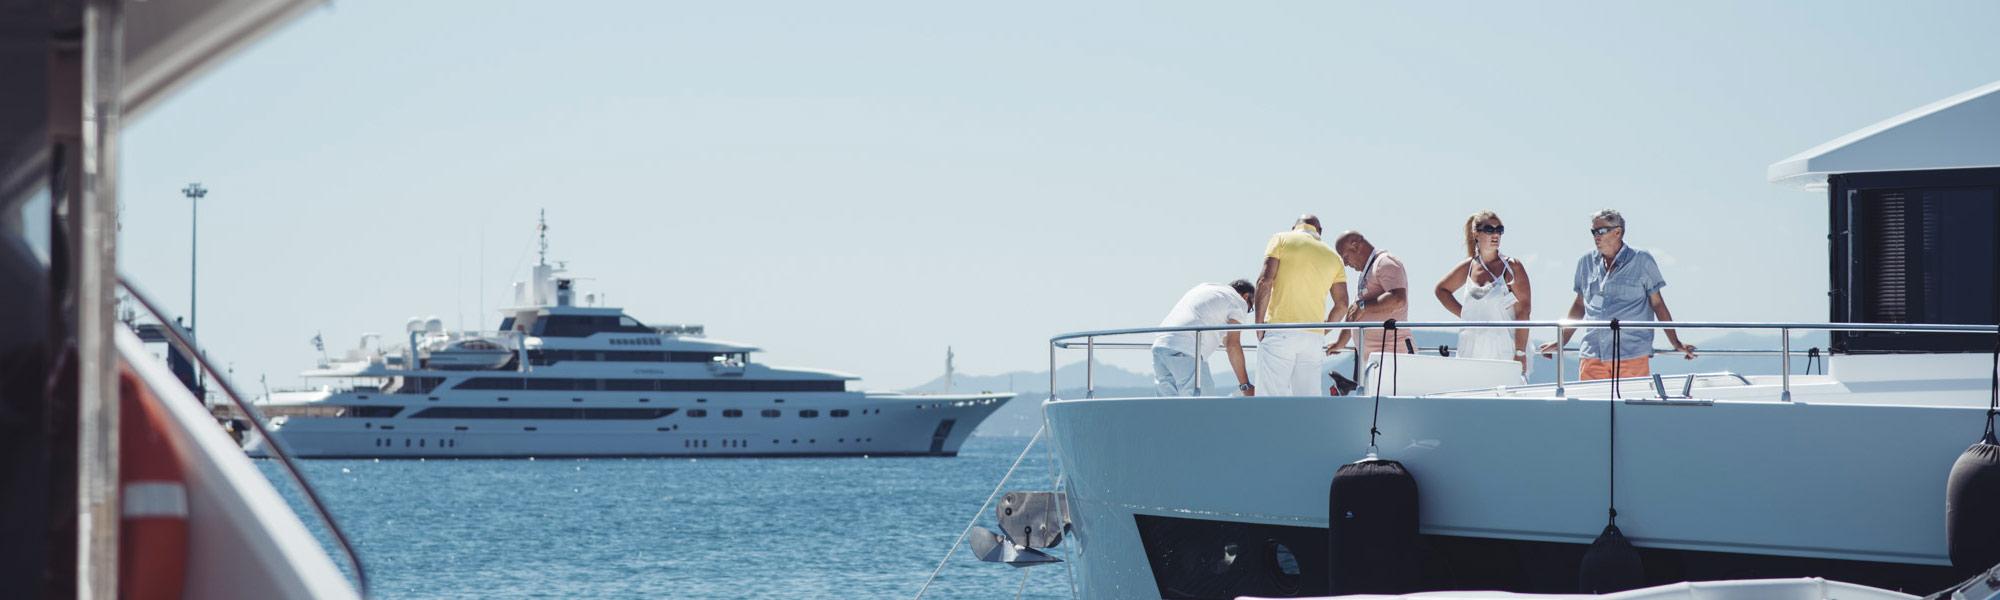 Ormeggio, Mooring Marina Golfo Aranci